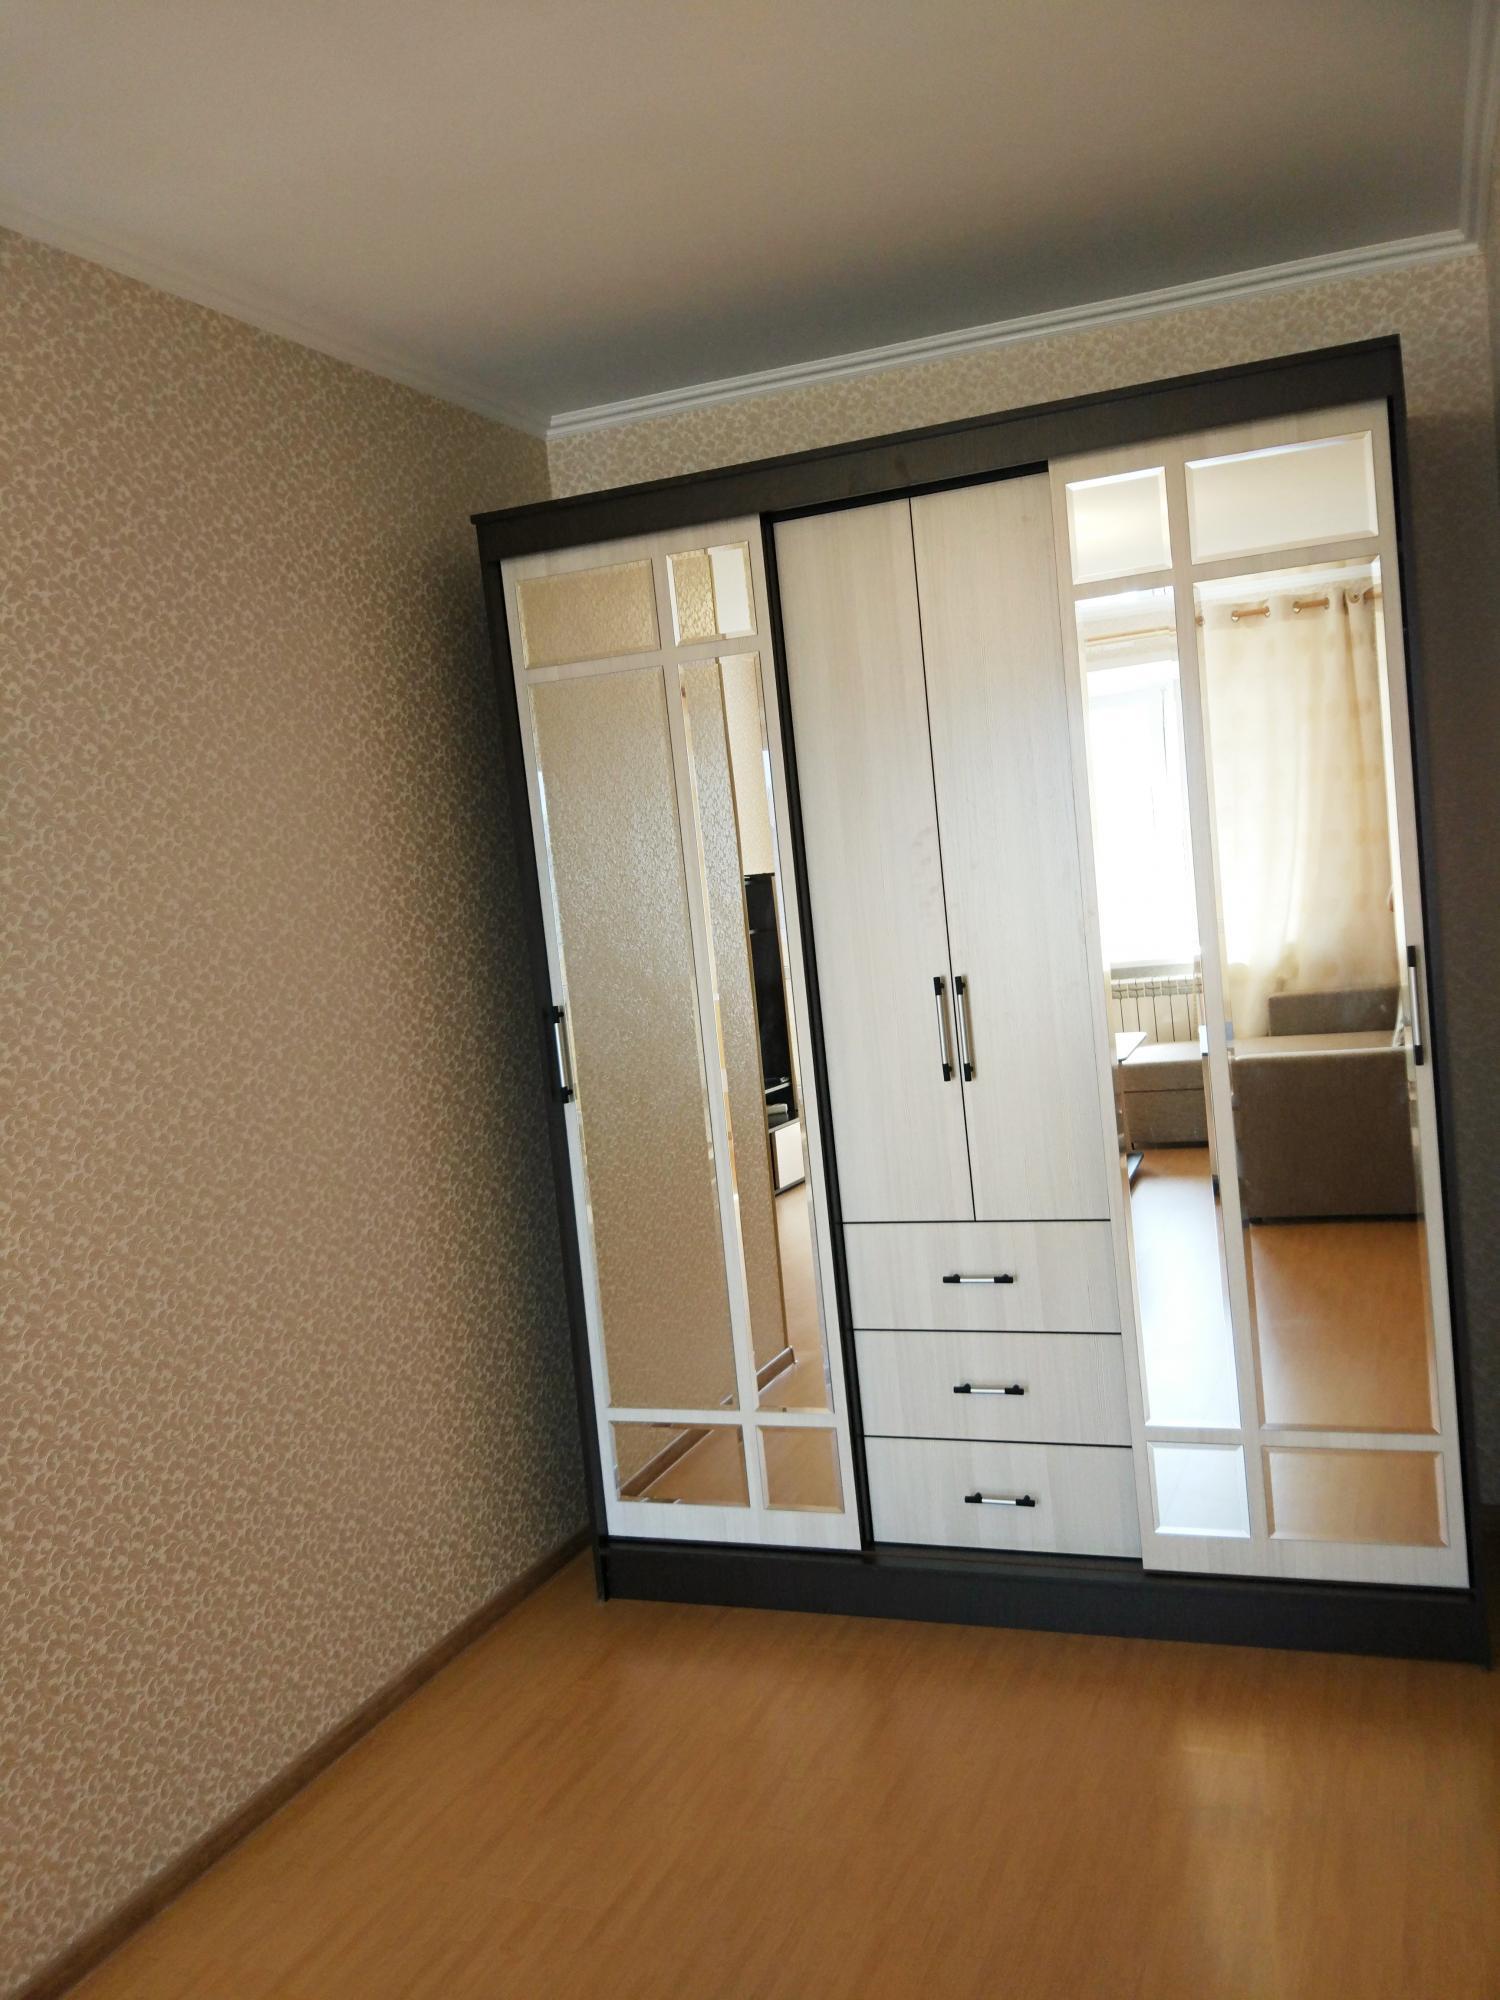 Квартира, 1 комната, 38 м² в Климовске 89258731076 купить 4